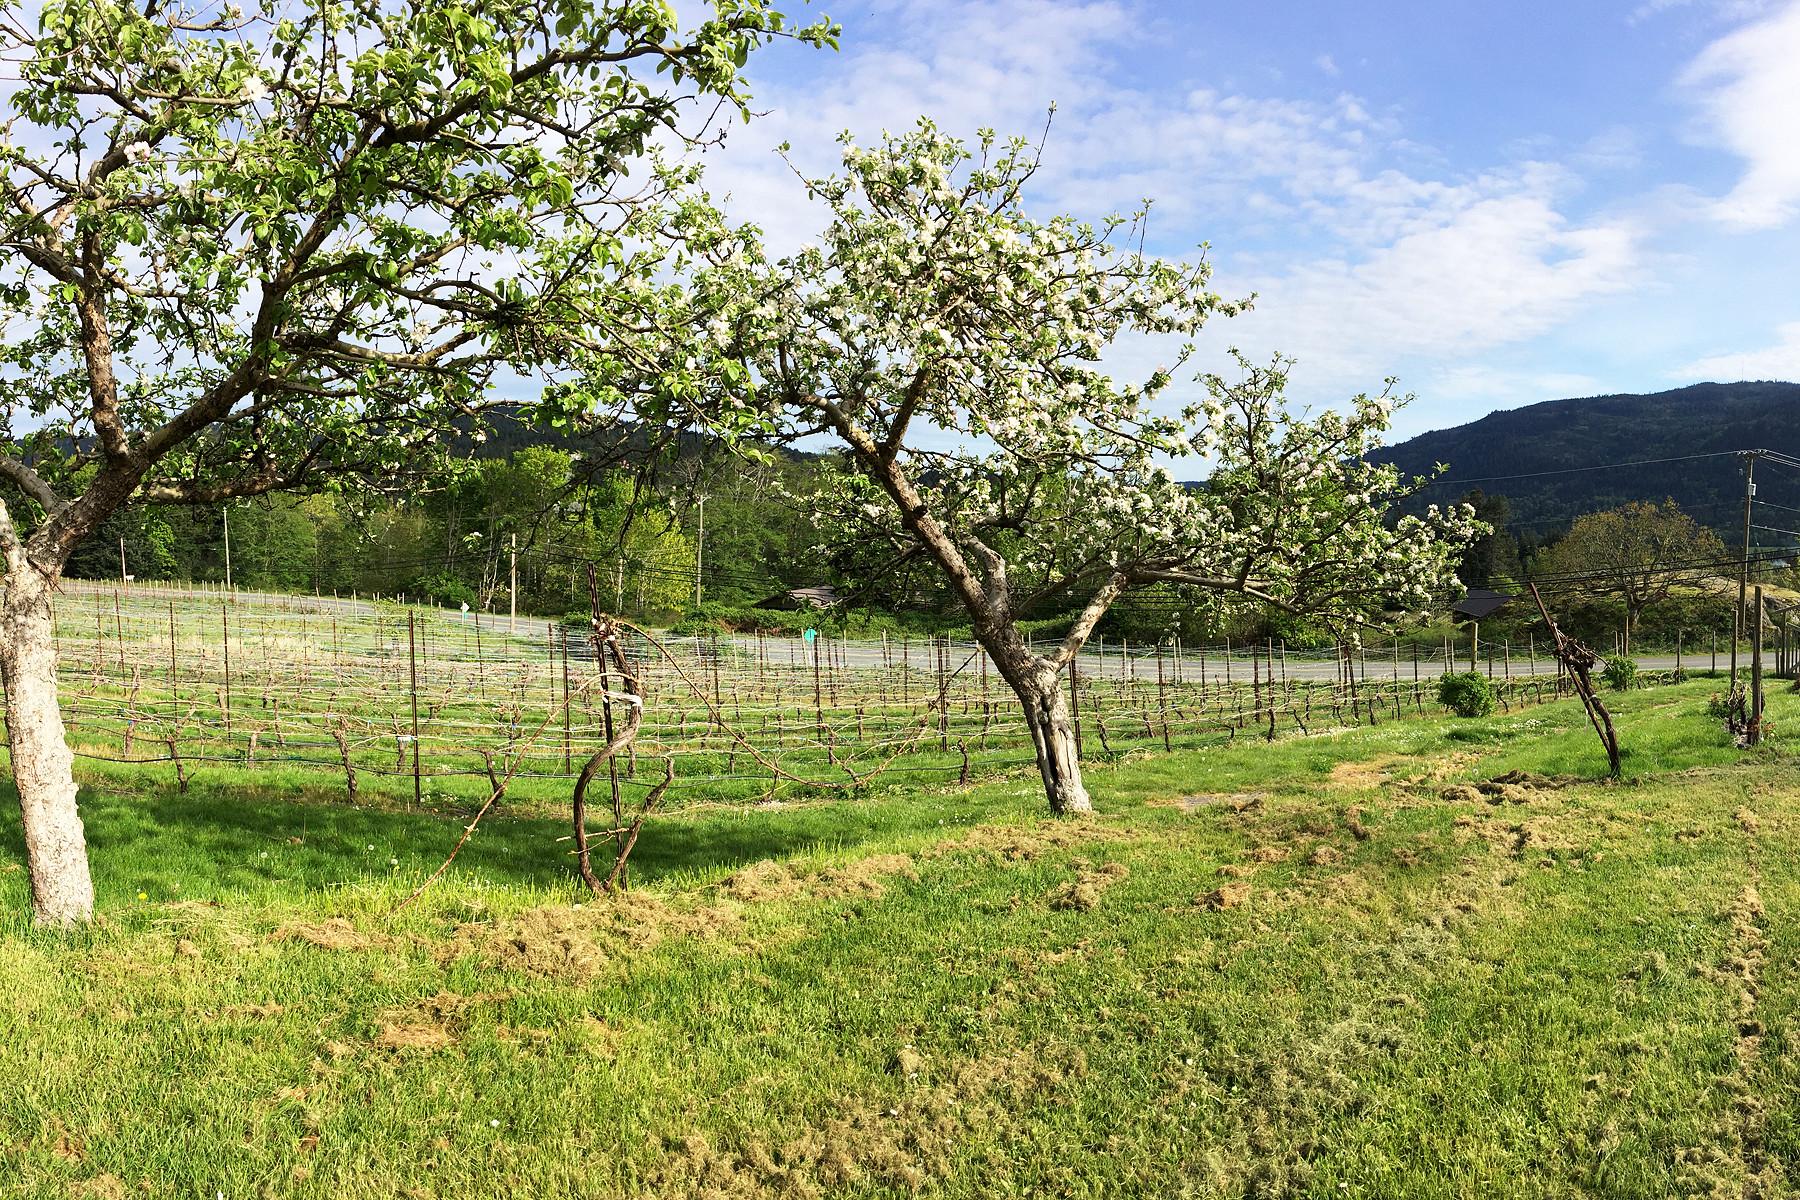 Ферма / ранчо / плантация для того Продажа на Salt Spring Island Vineyards 151 Lee Road Salt Spring Island, Британская Колумбия, V8K 2A5 Канада